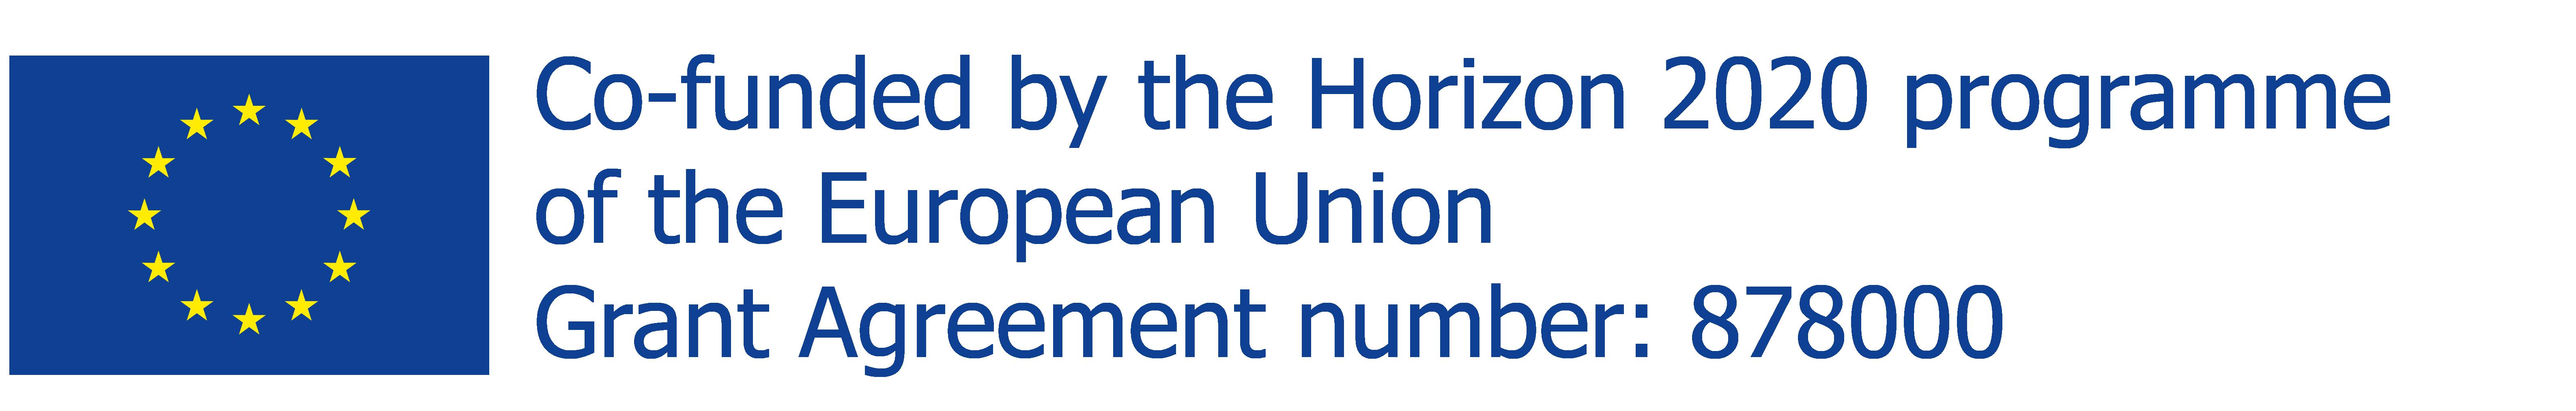 EU Logo Horizon 2020